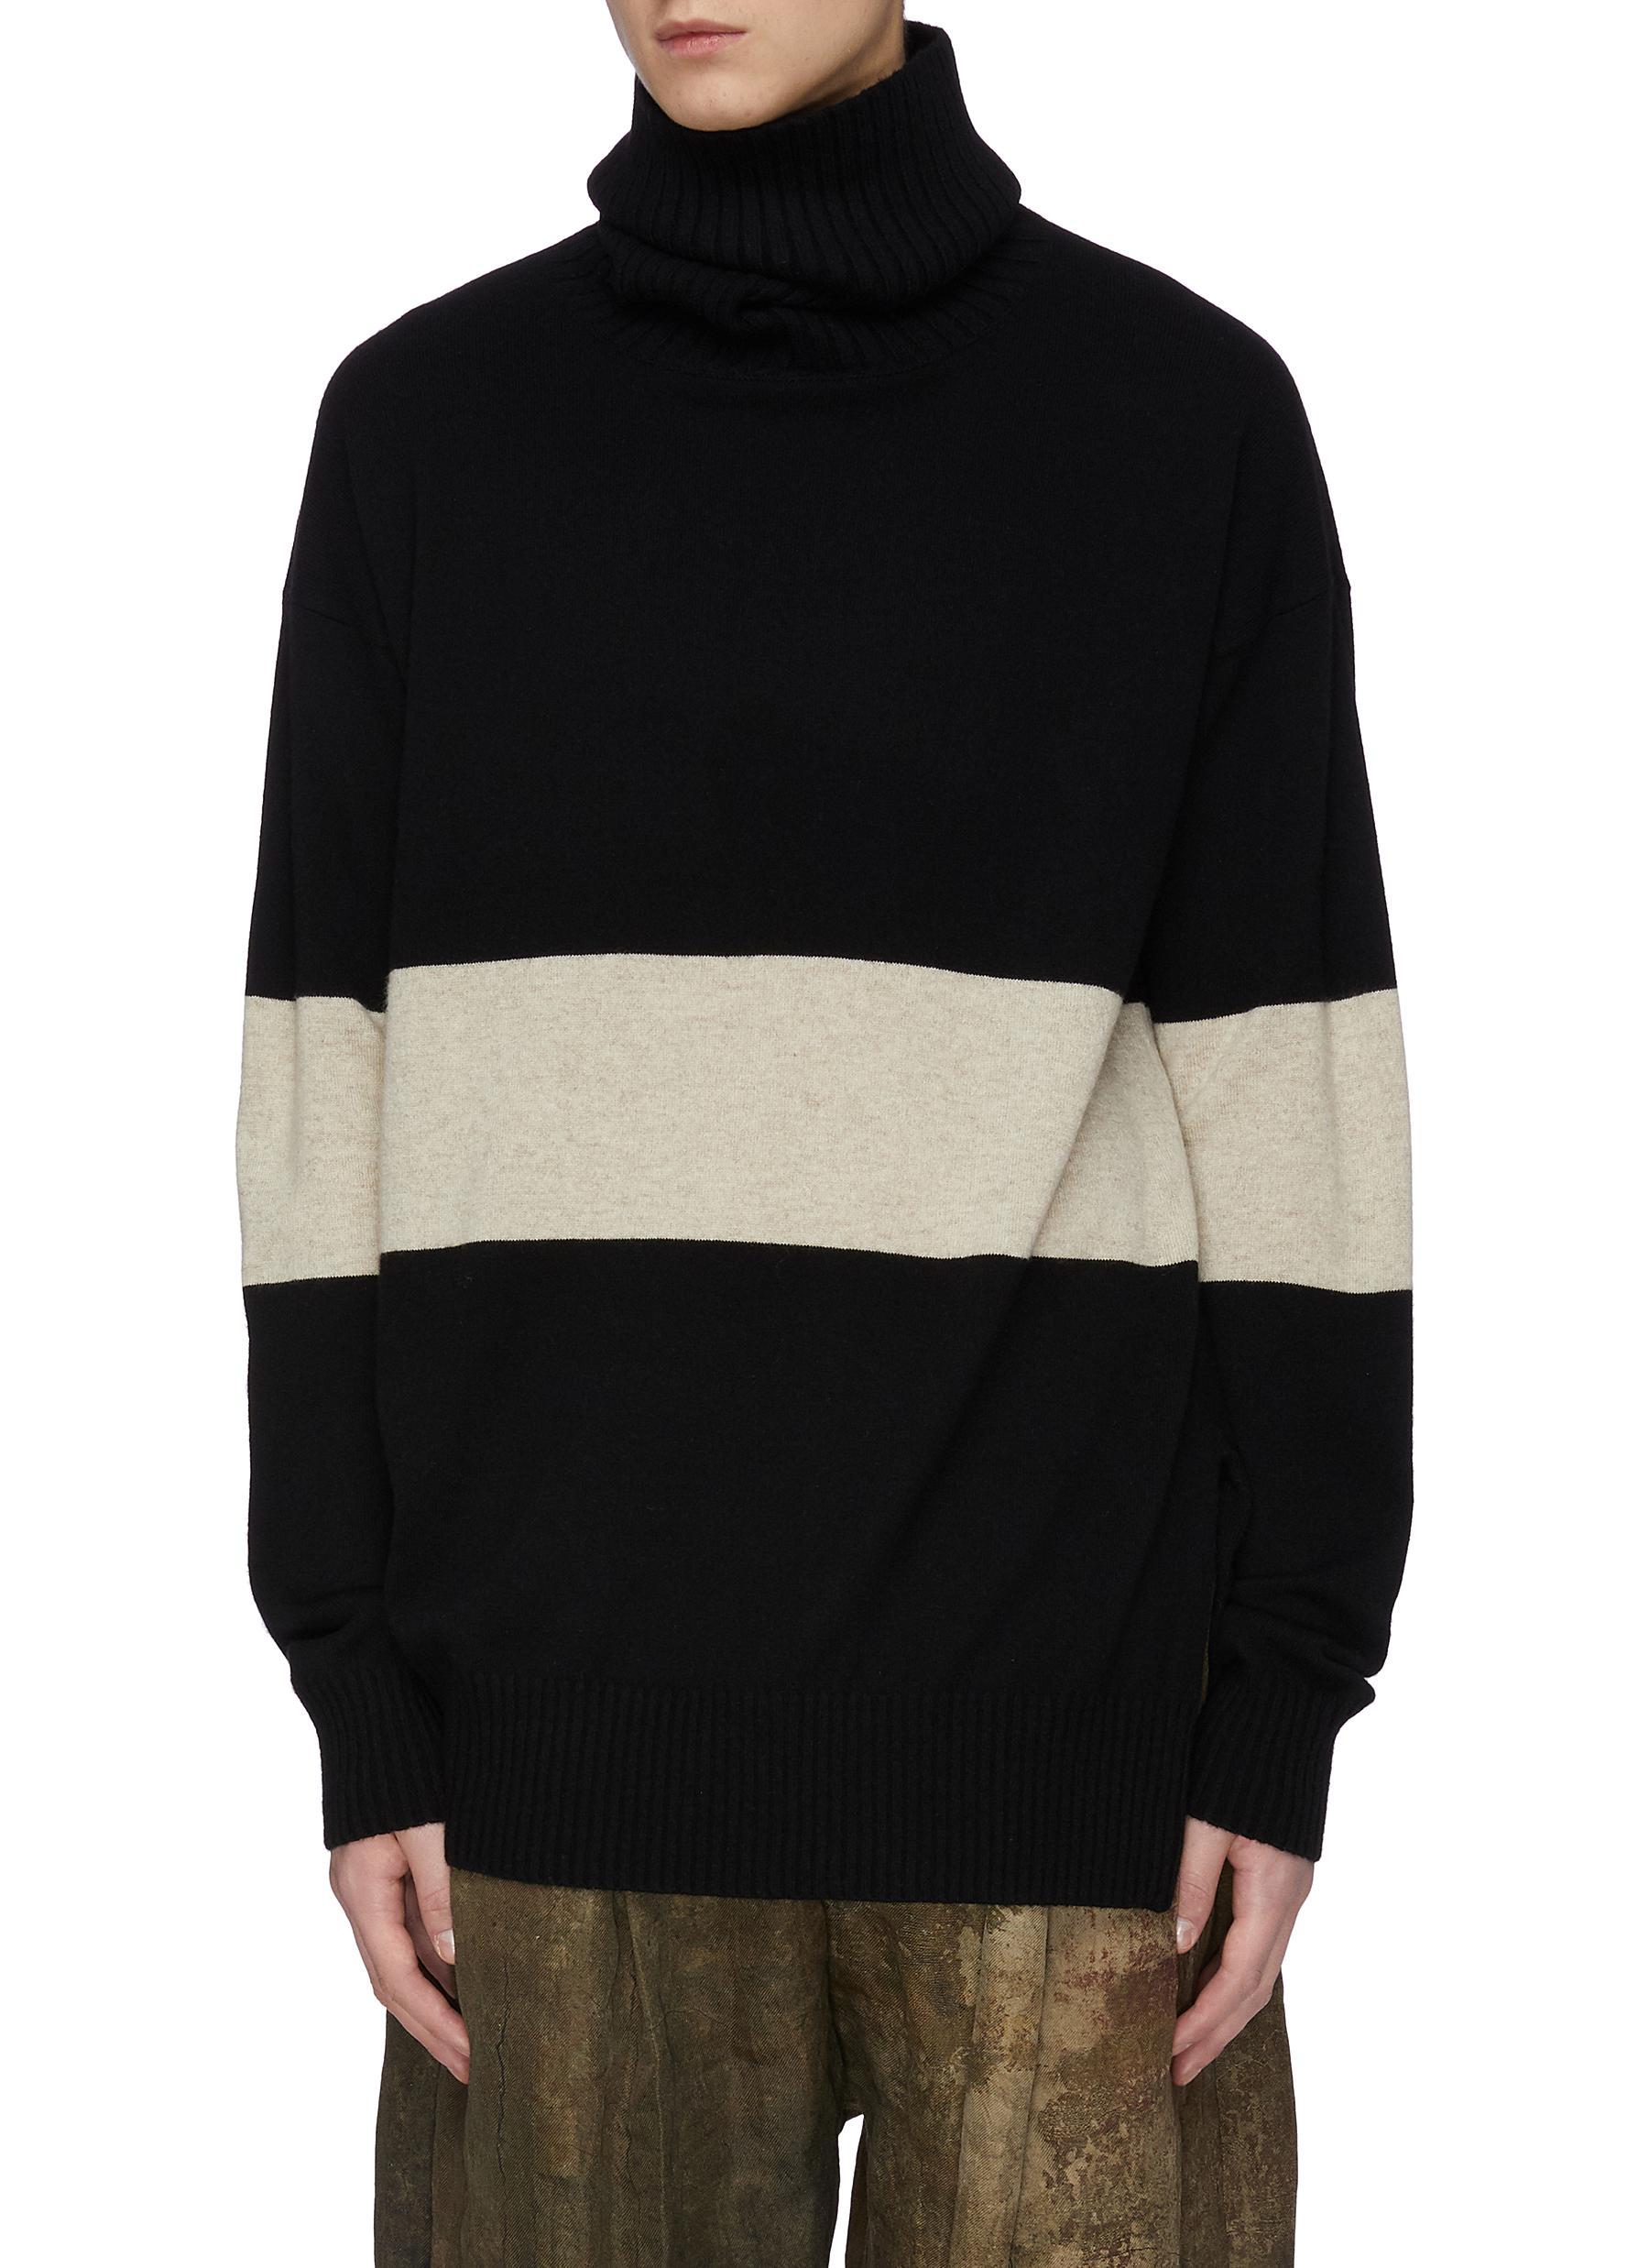 Ziggy Chen Ribbed Turtleneck Colourblock Cashmere Knit Sweater In Black